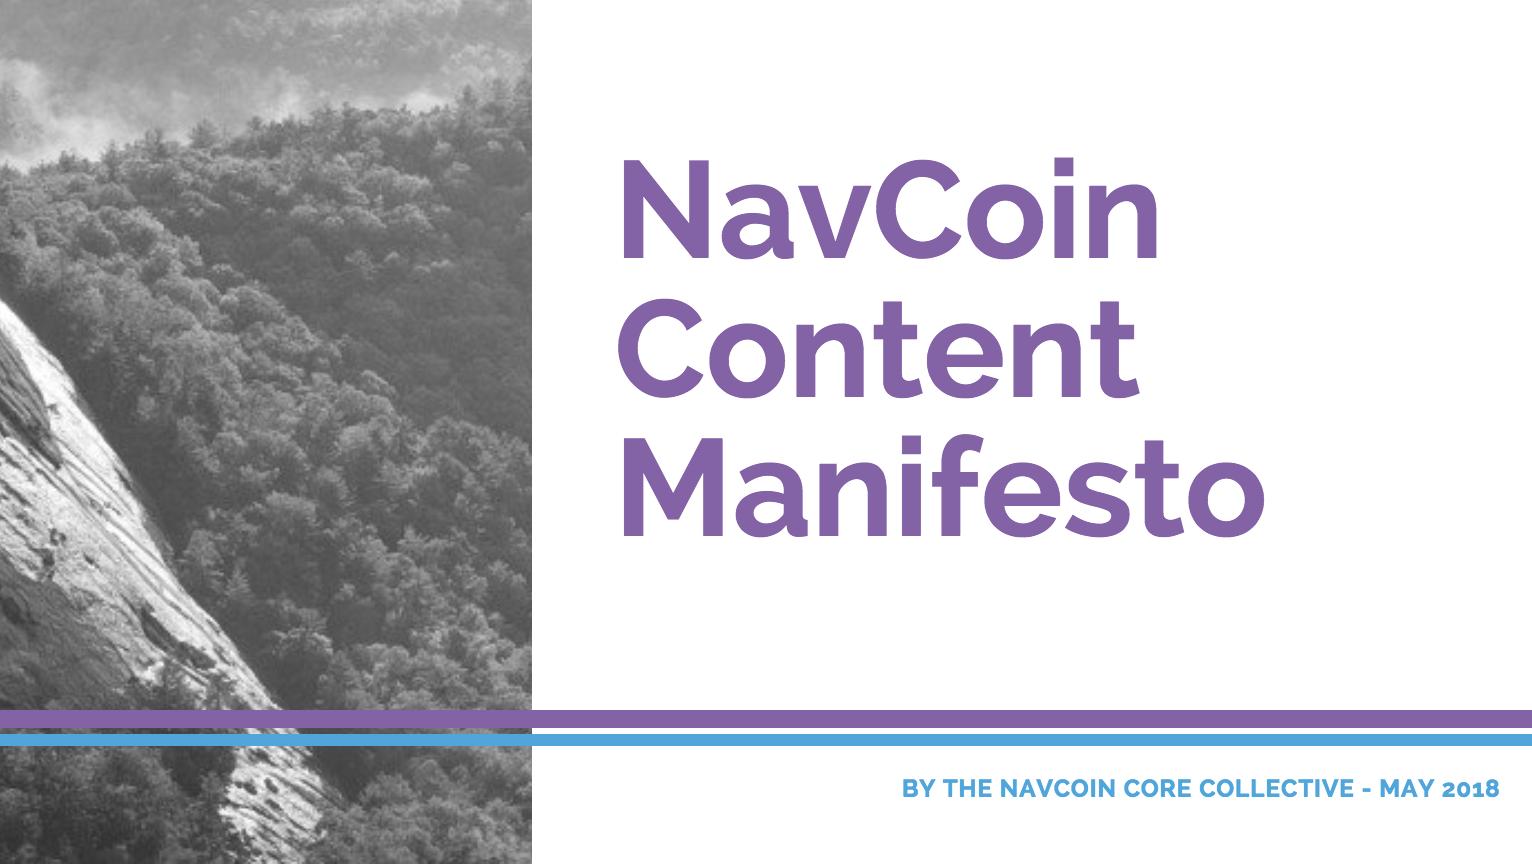 NavCoin Content Manifesto